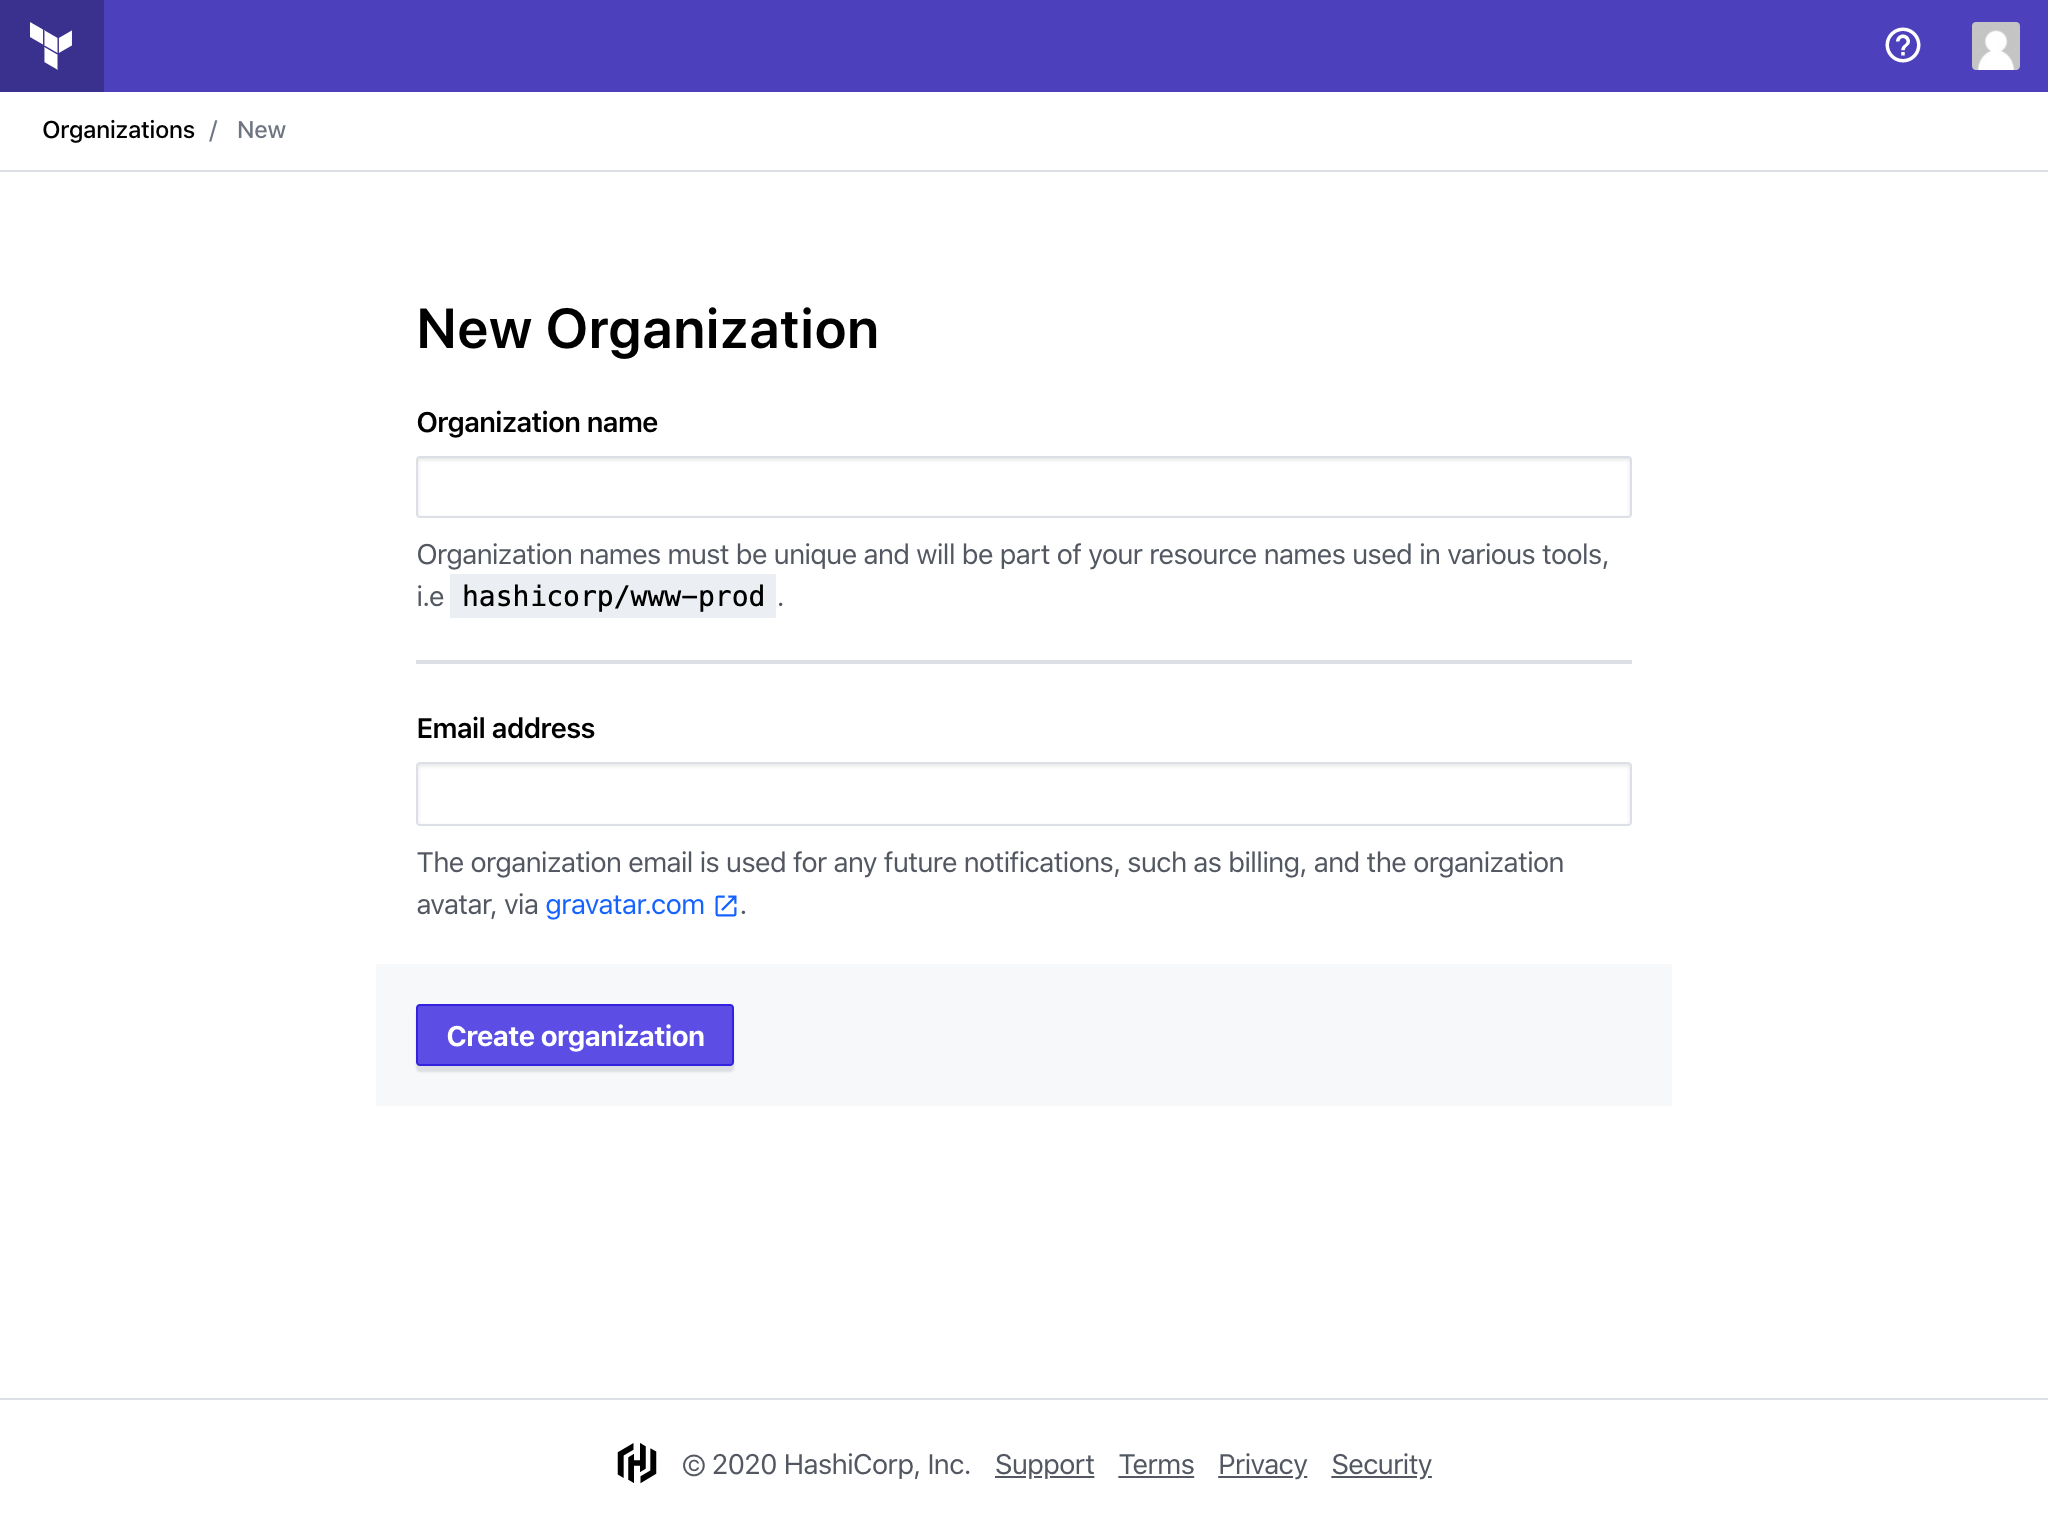 Create Organization